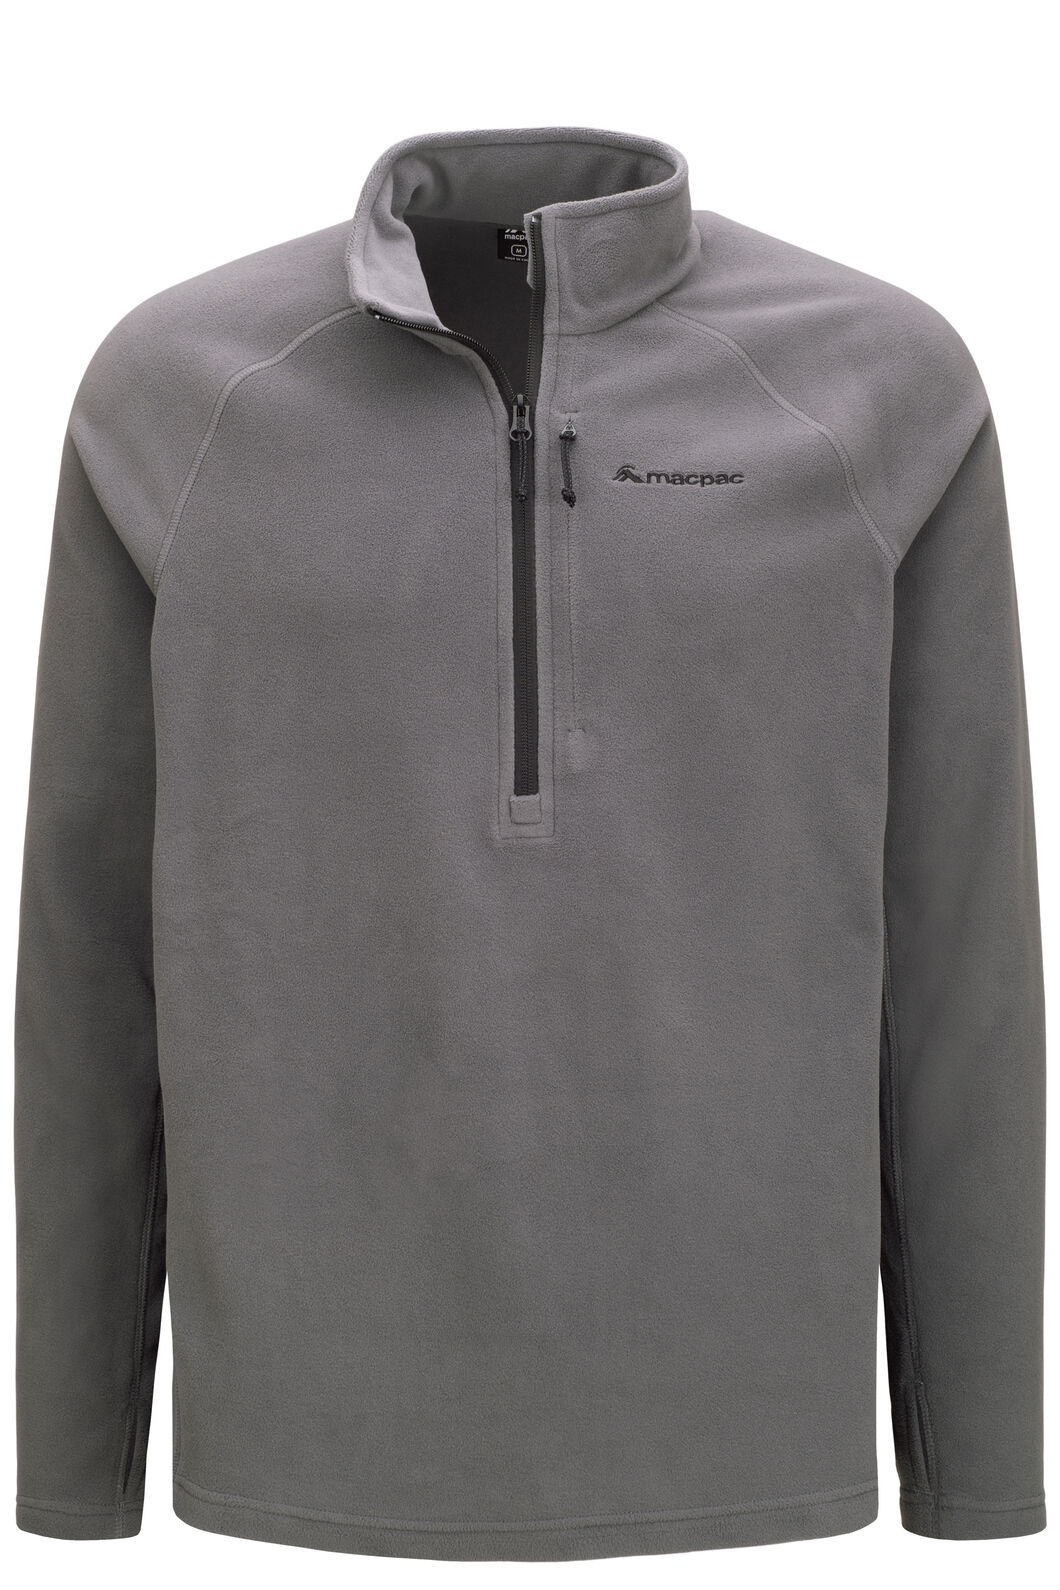 Macpac Men's Tui Polartec® Micro Fleece® Pullover, Iron Gate/Black, hi-res